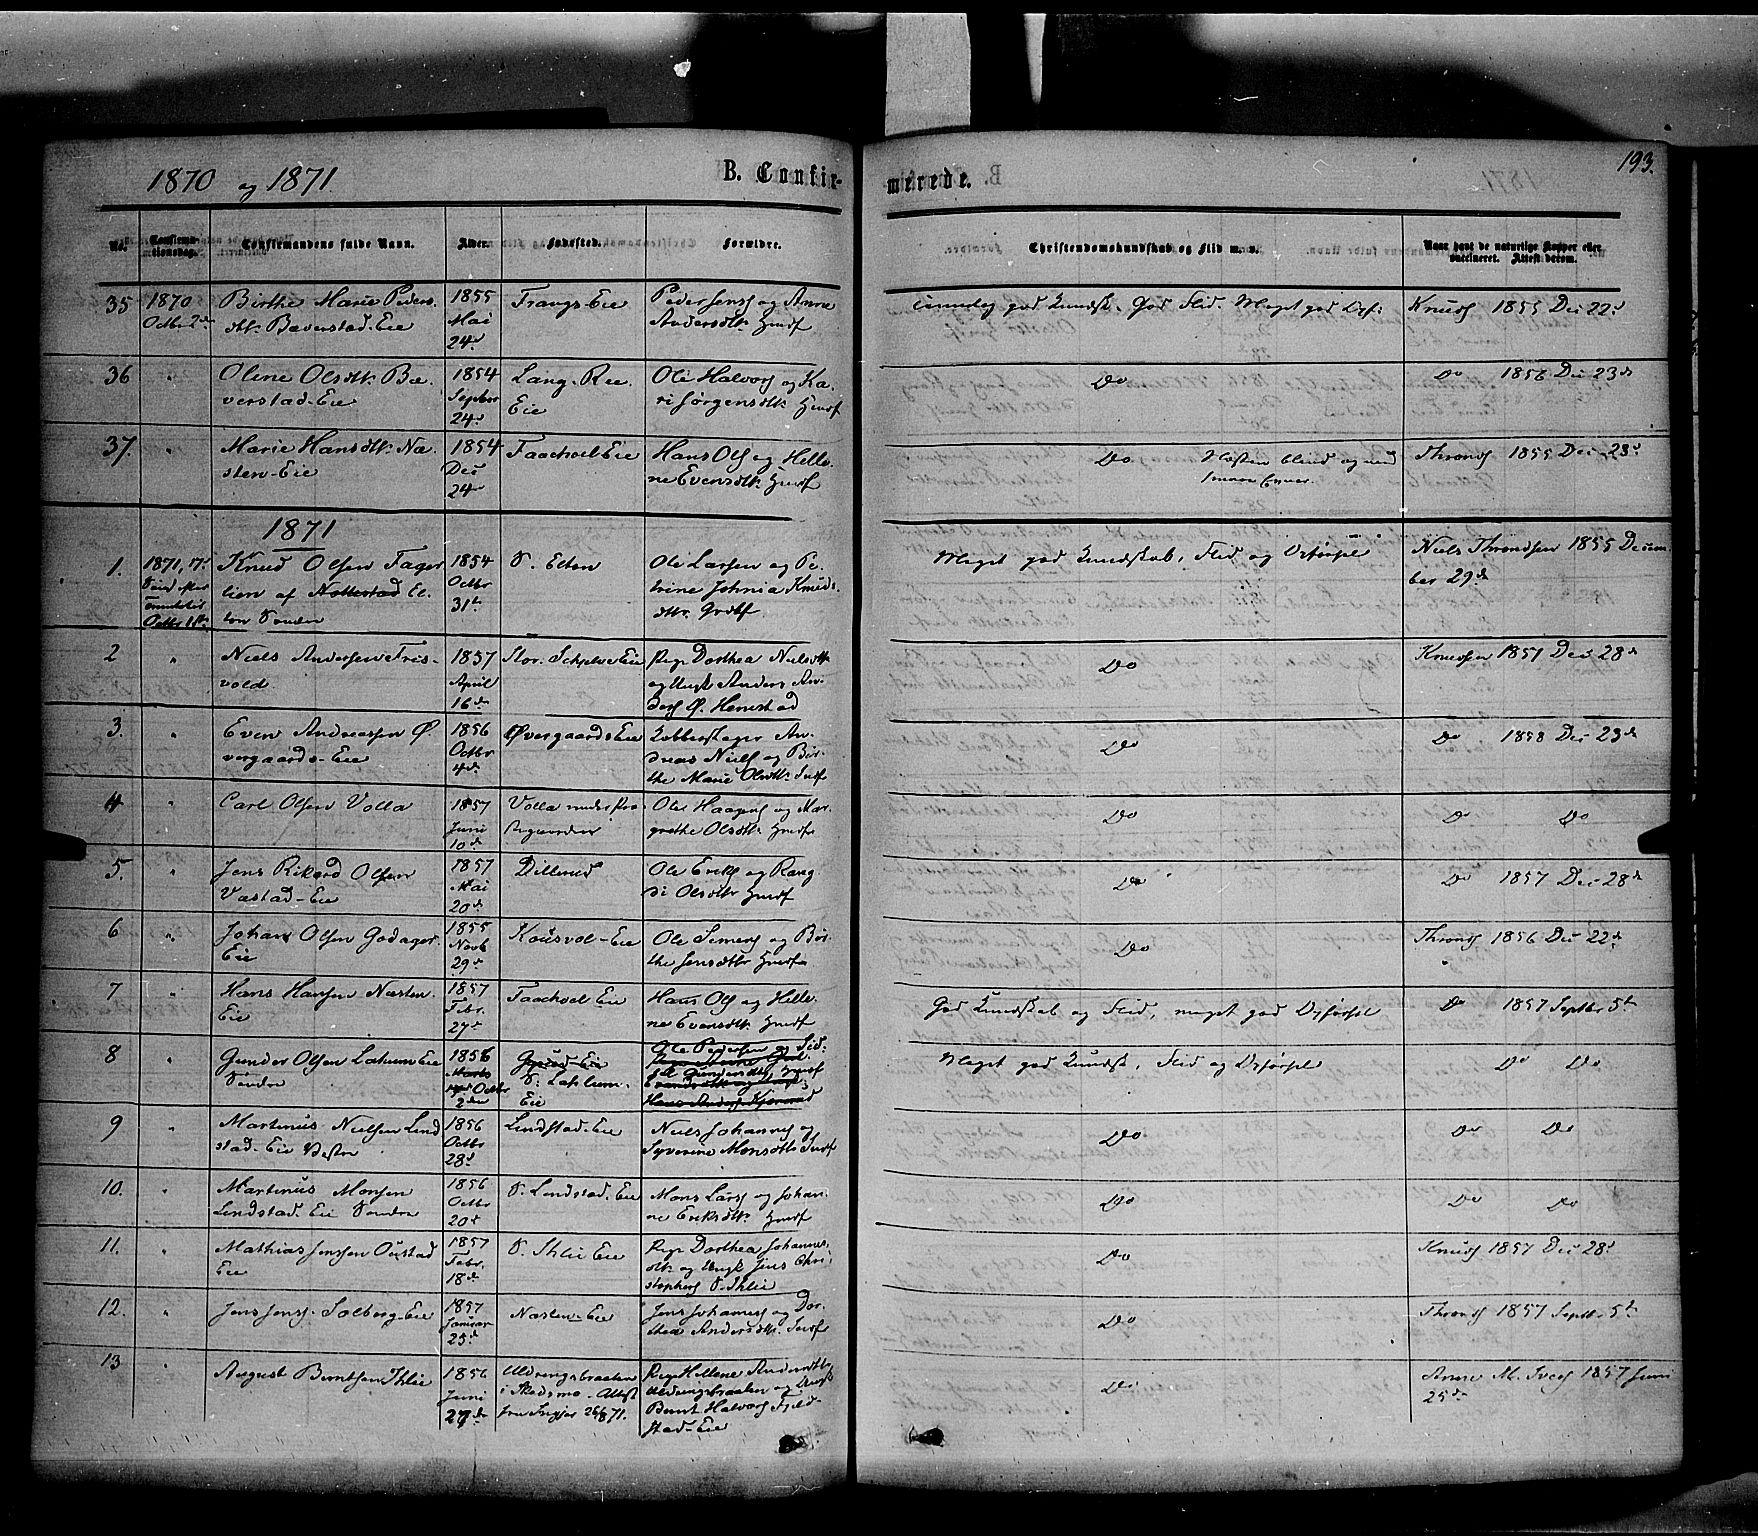 SAH, Stange prestekontor, K/L0013: Ministerialbok nr. 13, 1862-1879, s. 193